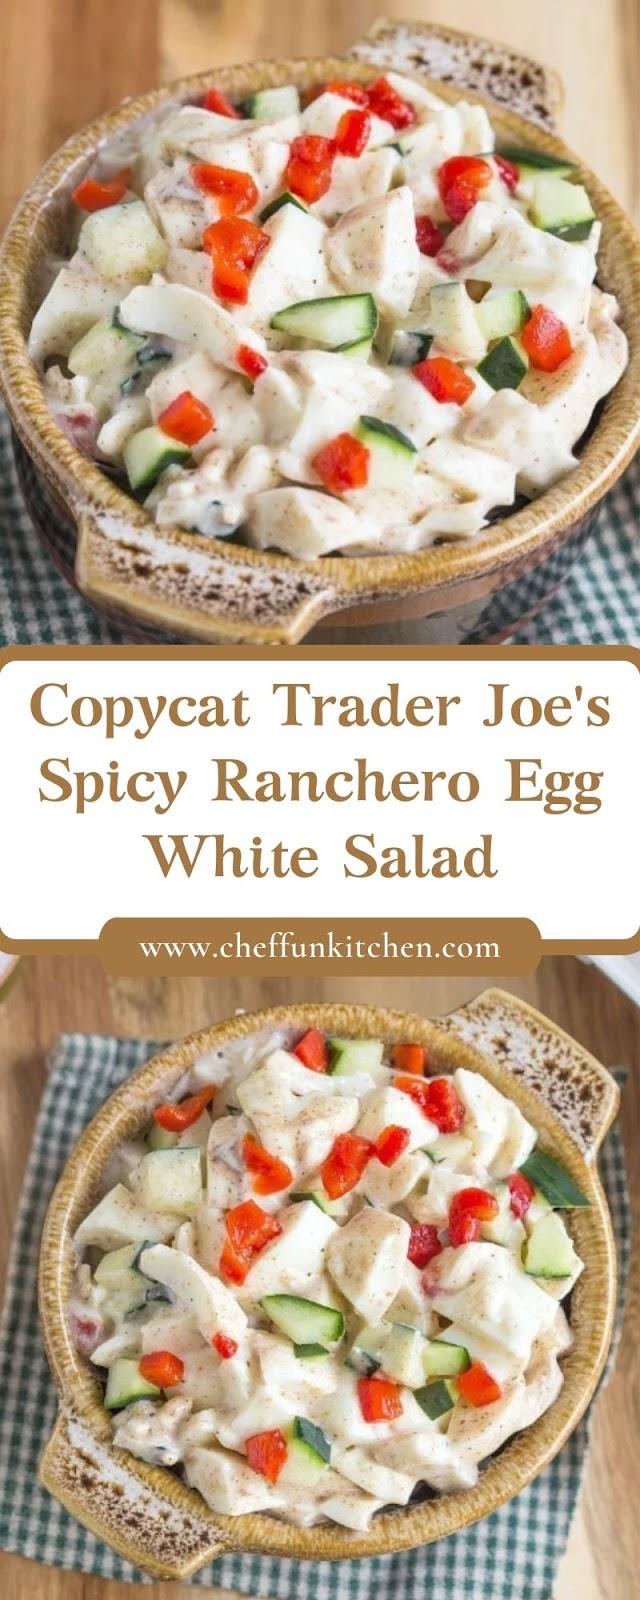 Copycat Trader Joe's Spicy Ranchero Egg White Salad